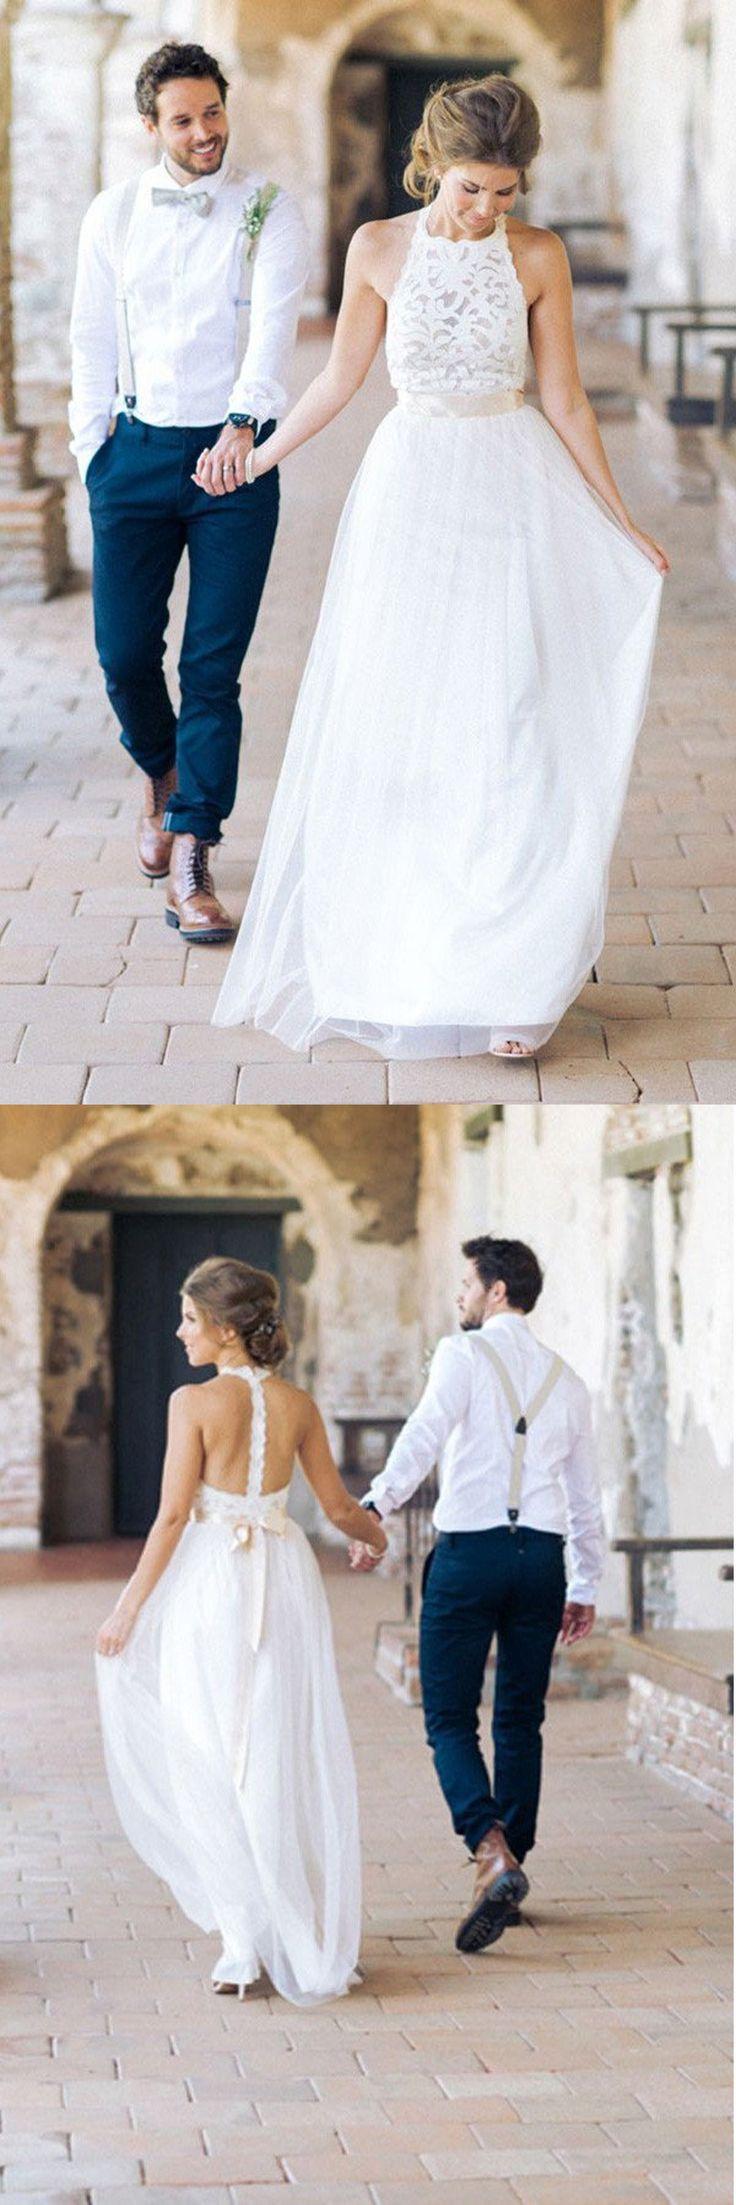 Simple Jewel Sleeveless Wedding DressChiffon Lace Top DressLace Tulle Beach